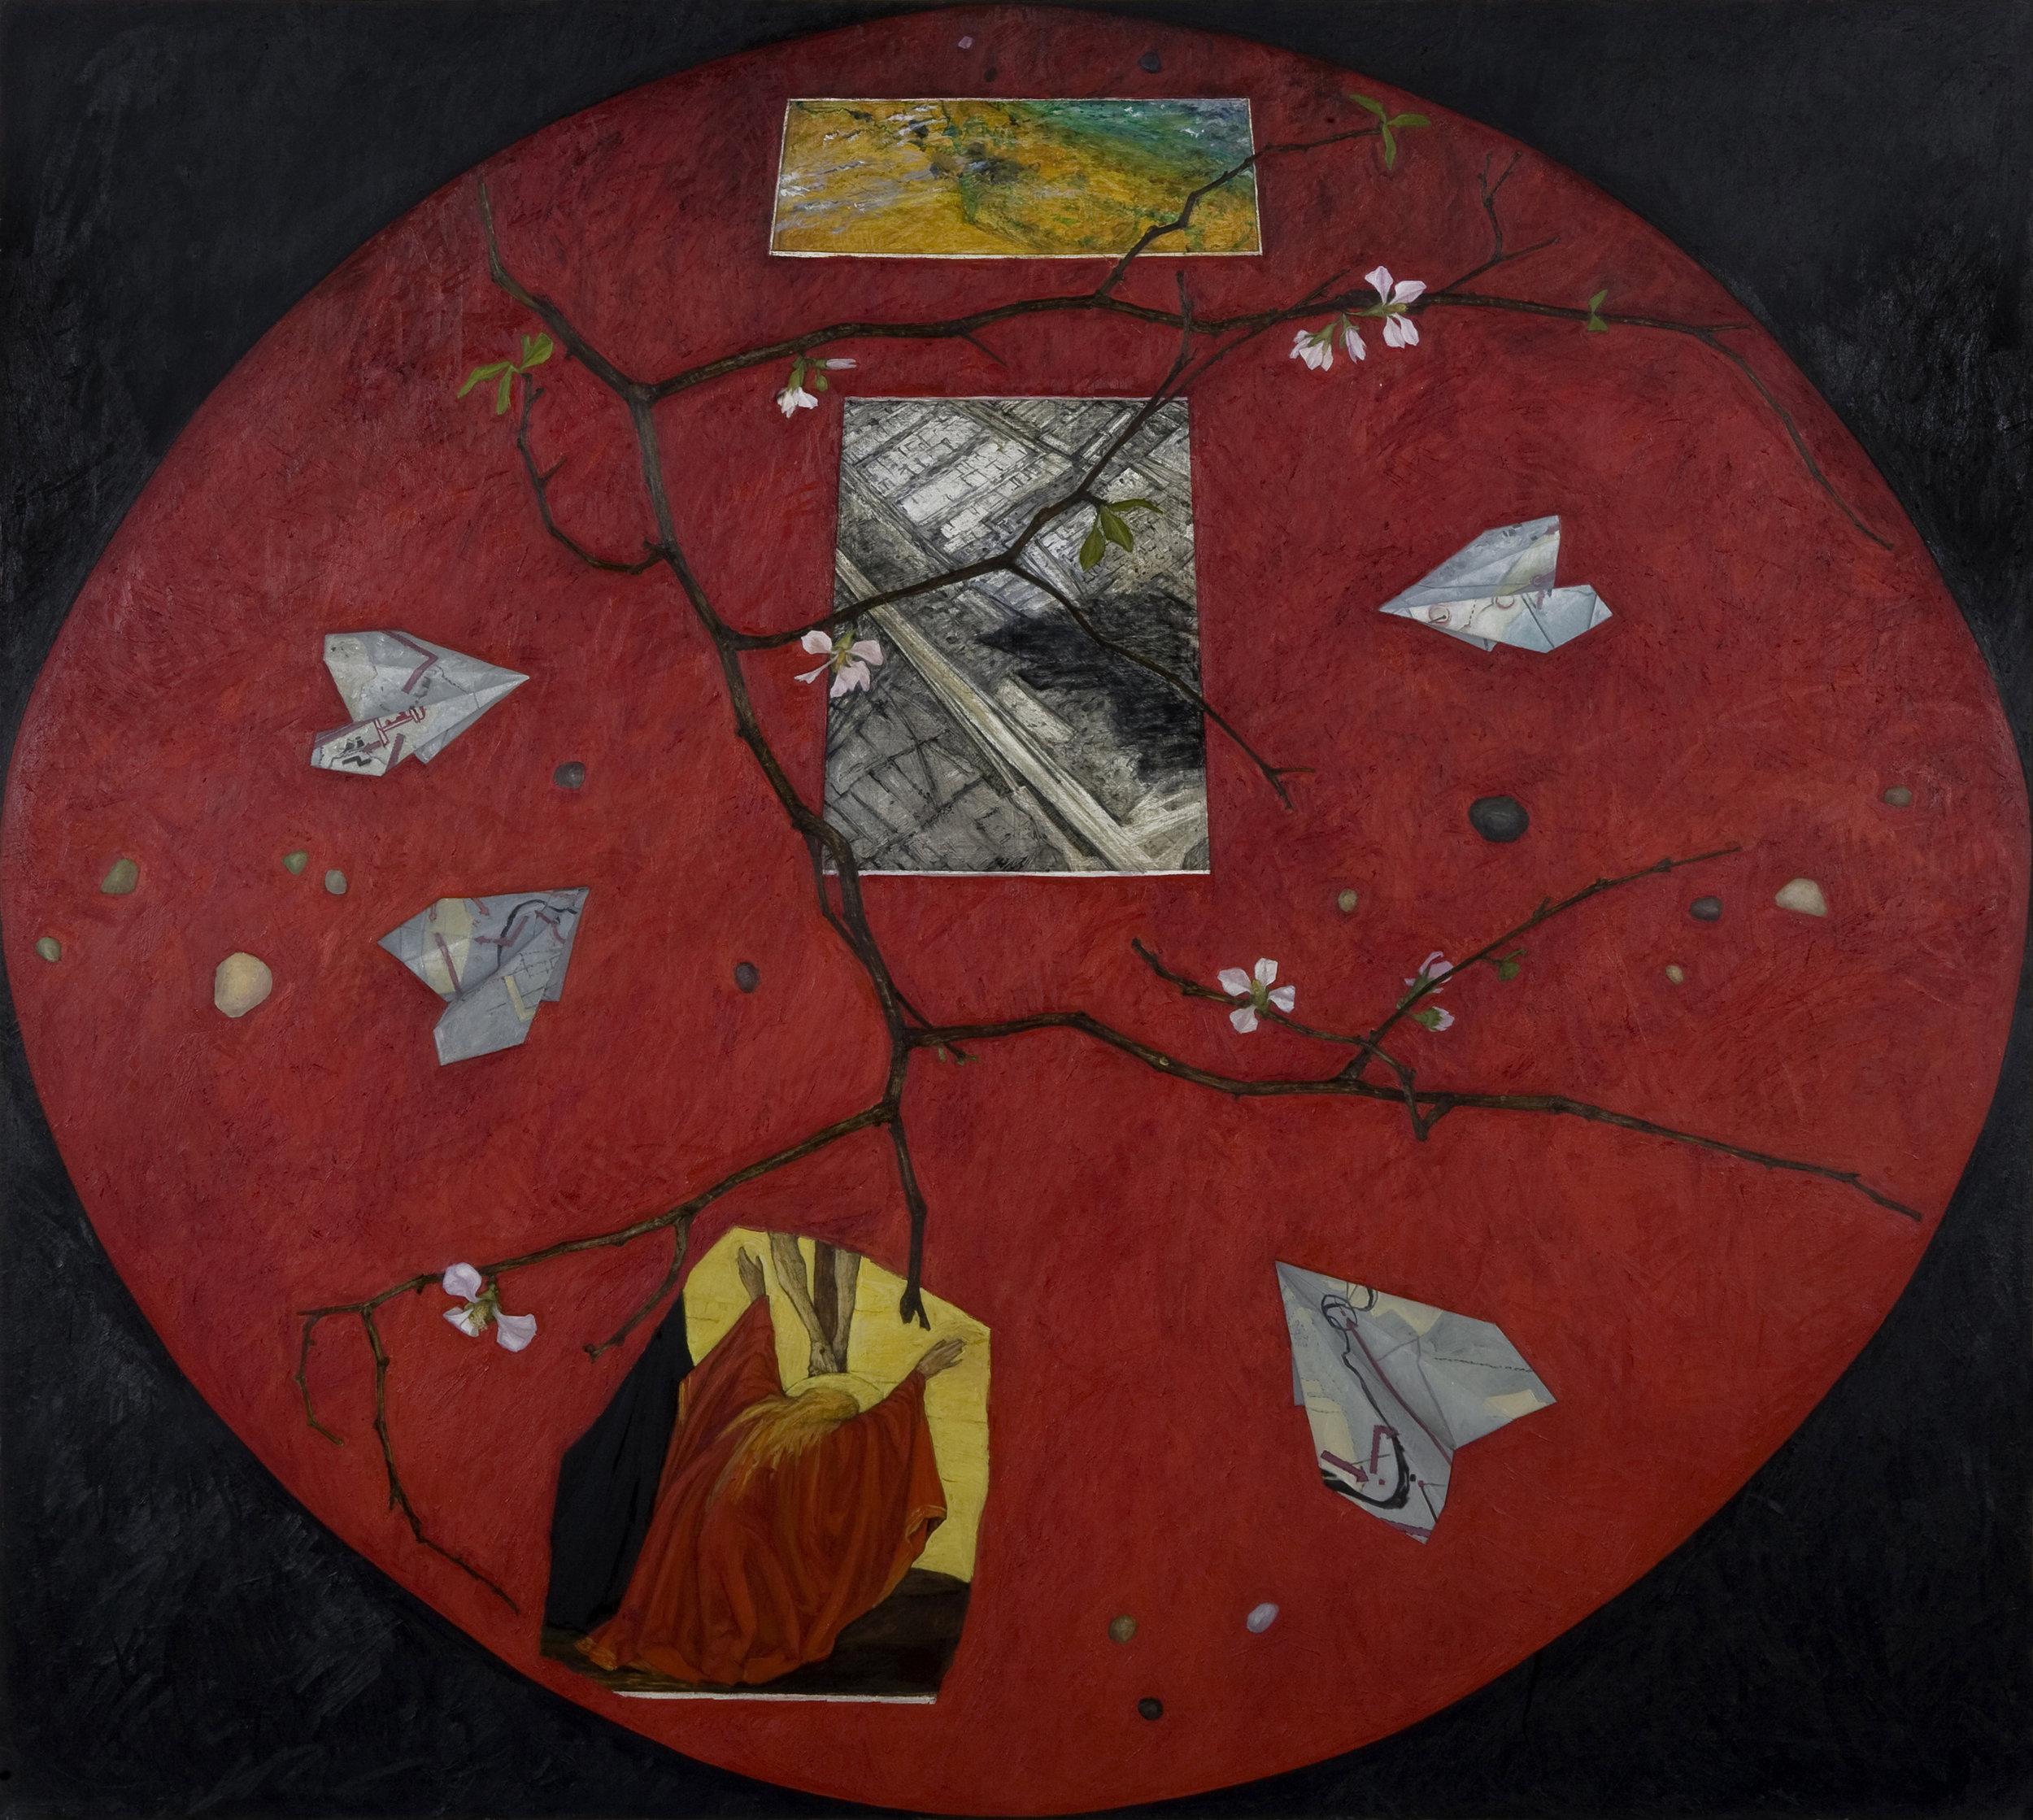 Regina Granne,  Red Table II , 2004, Oil on linen, 56 x 62 inches